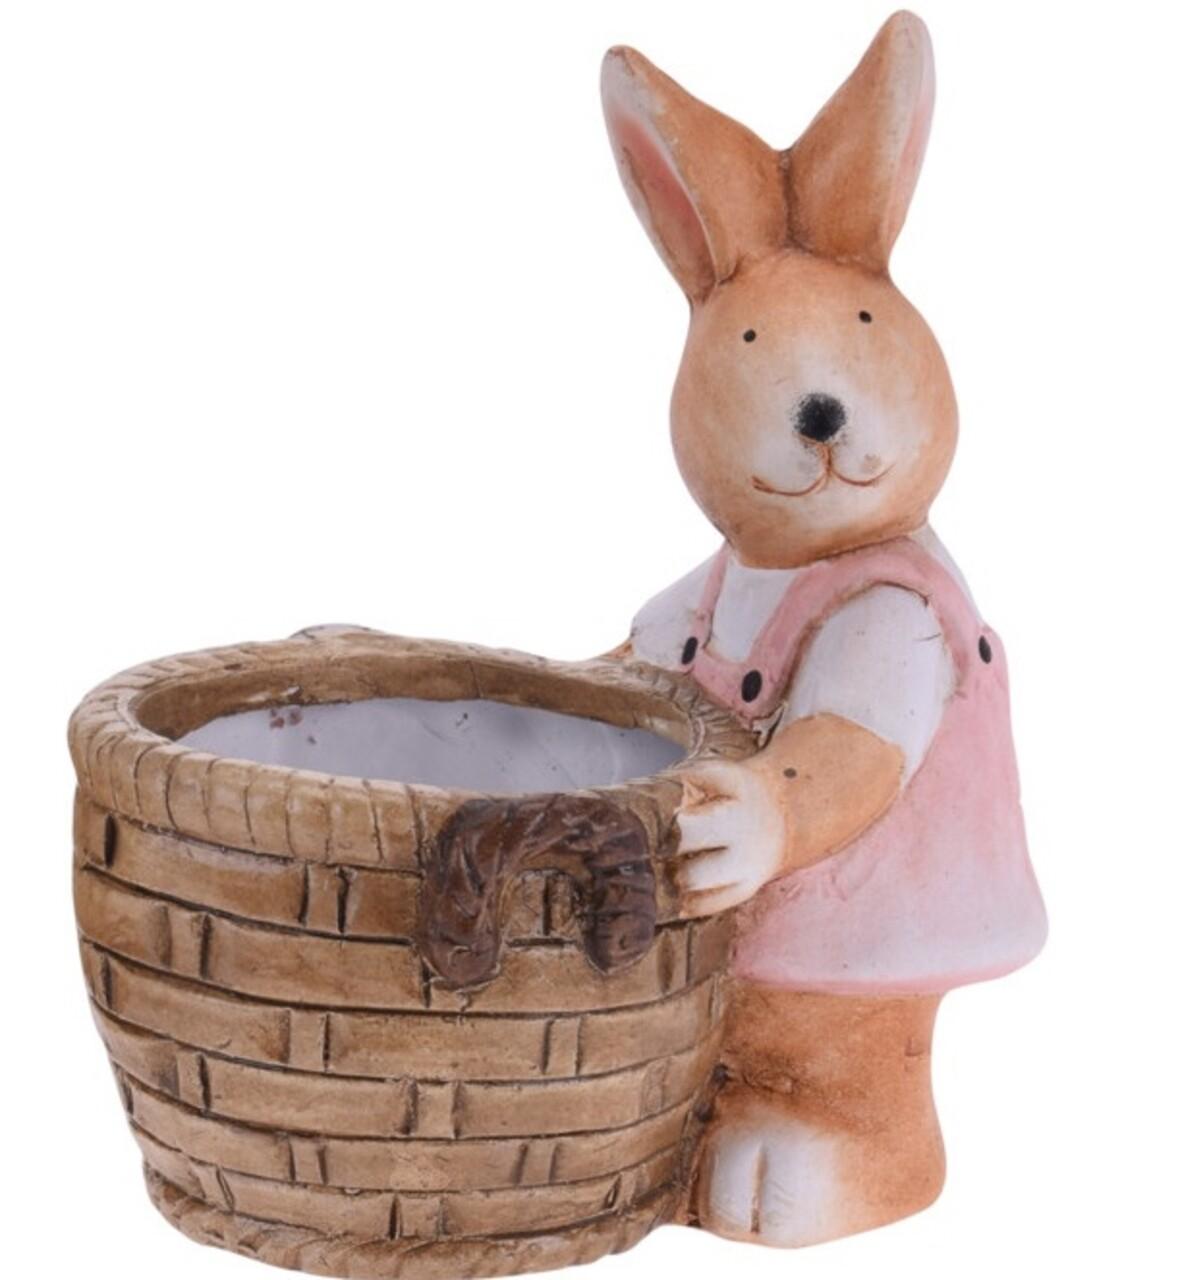 Decoratiune de paste Girl bunny with basket, 13x8.5x15.5 cm, teracota, roz